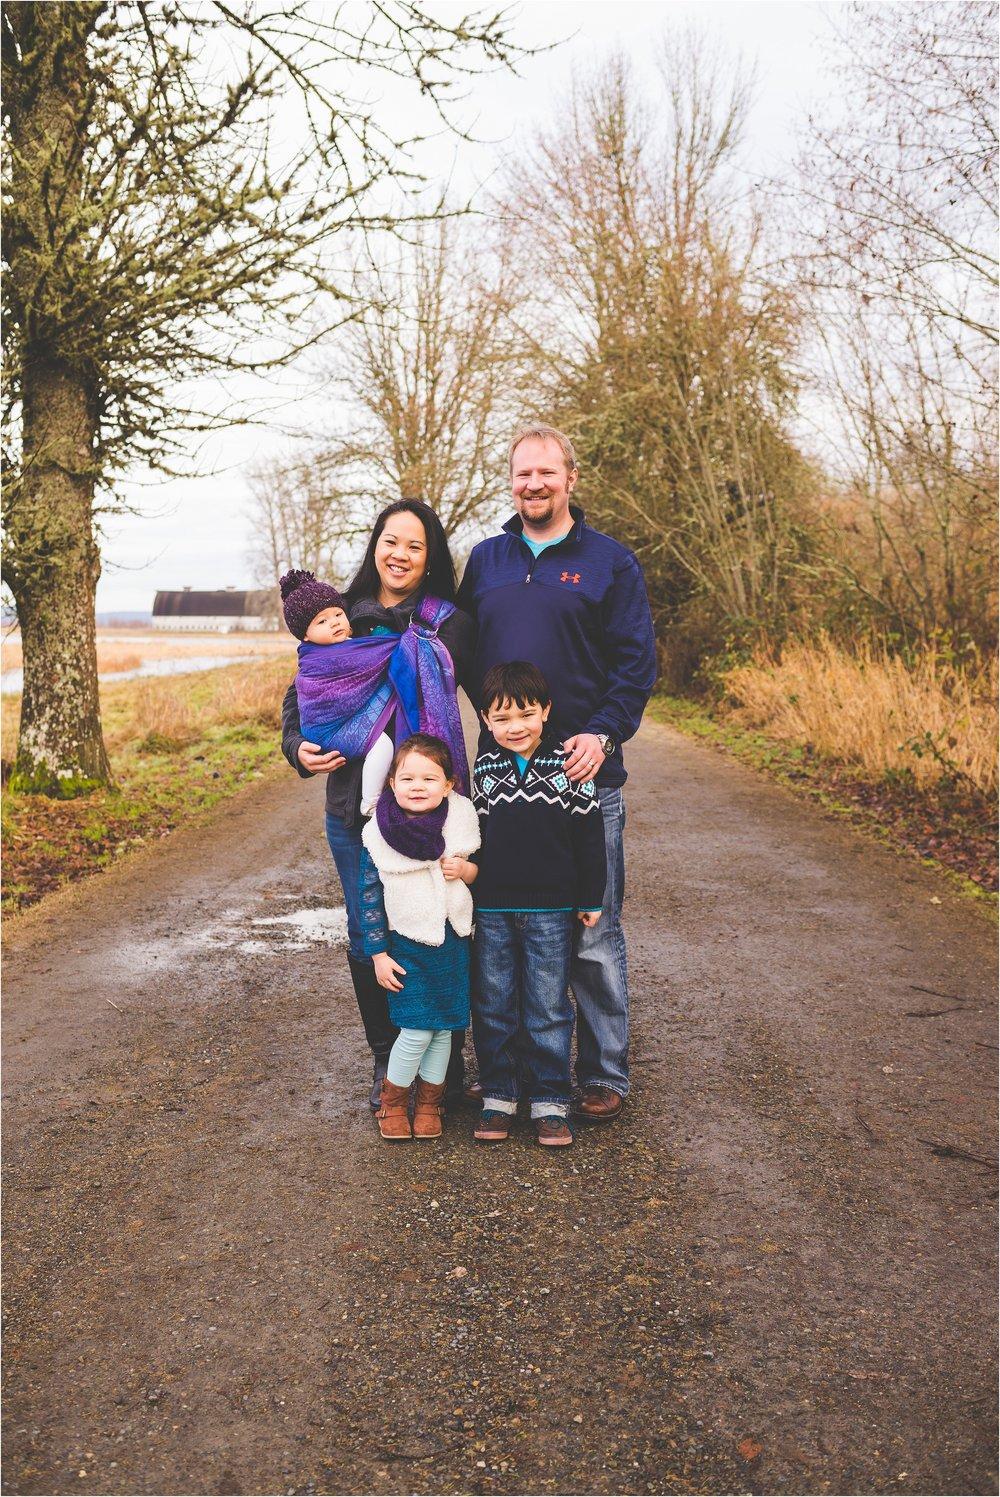 nisqually-wildlife-refuge-family-session-jannicka-mayte-olympia-wa-family-photographer_0002.jpg